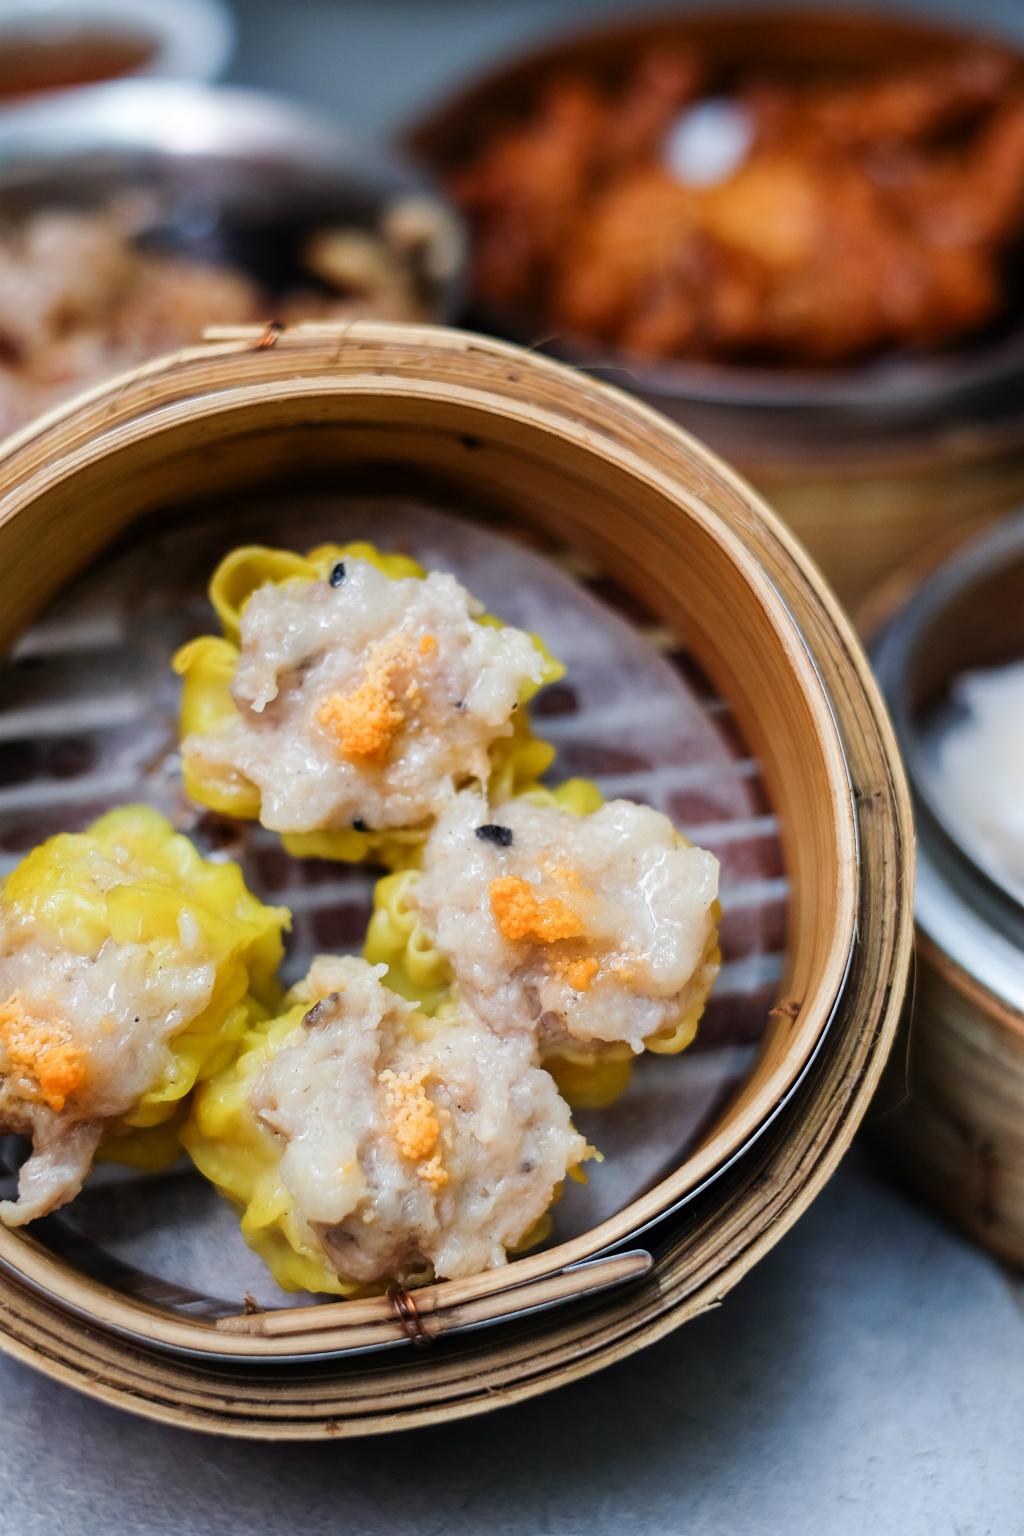 Saam Hui Yaat Dim Sum Restaurant's crab meat siu mai